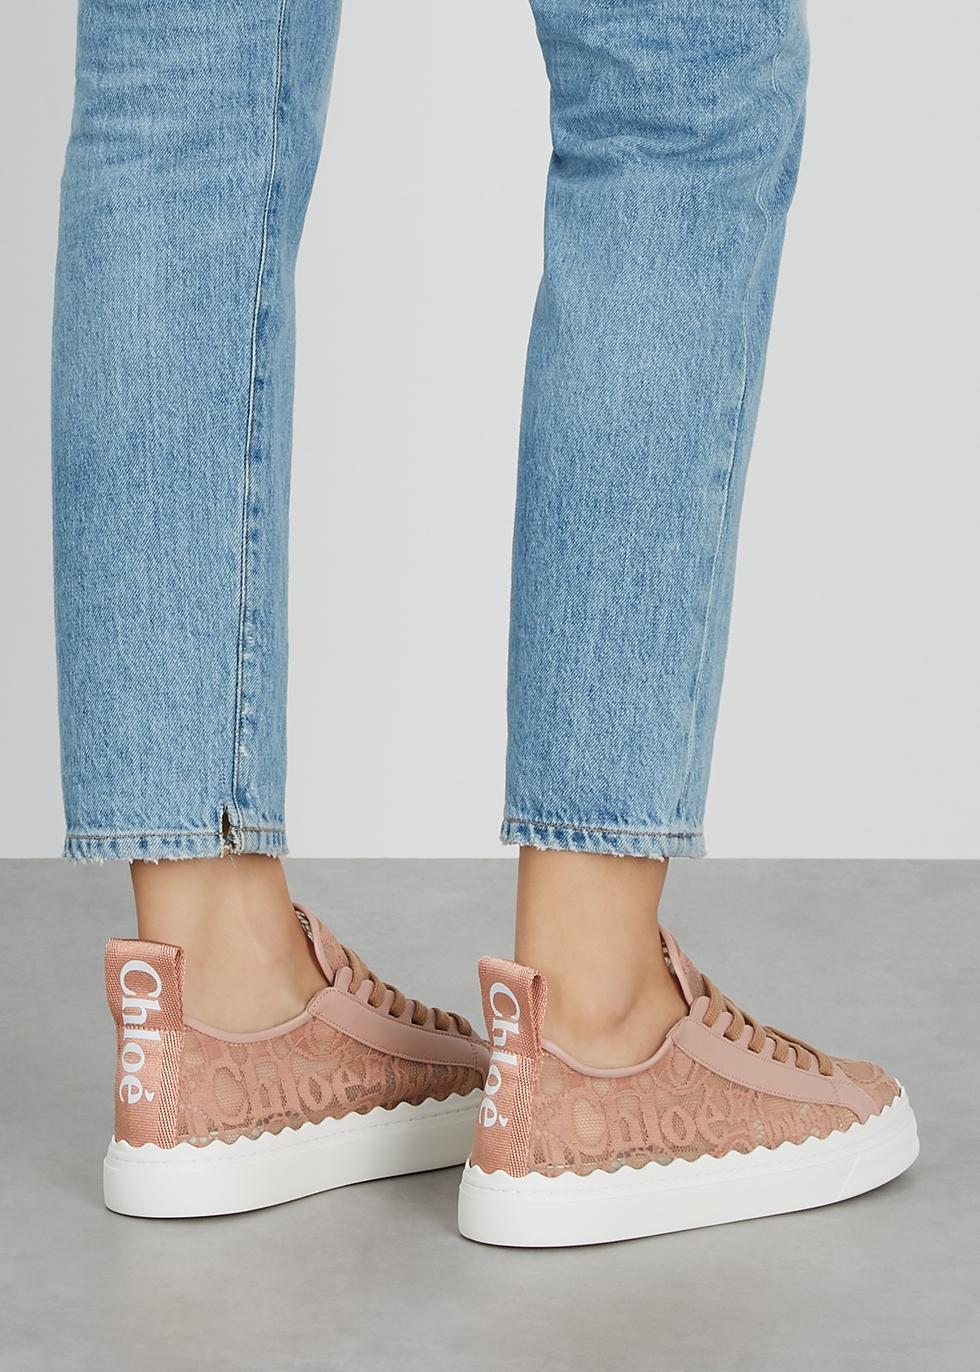 Lauren rose lace sneakers - Harvey Nichols